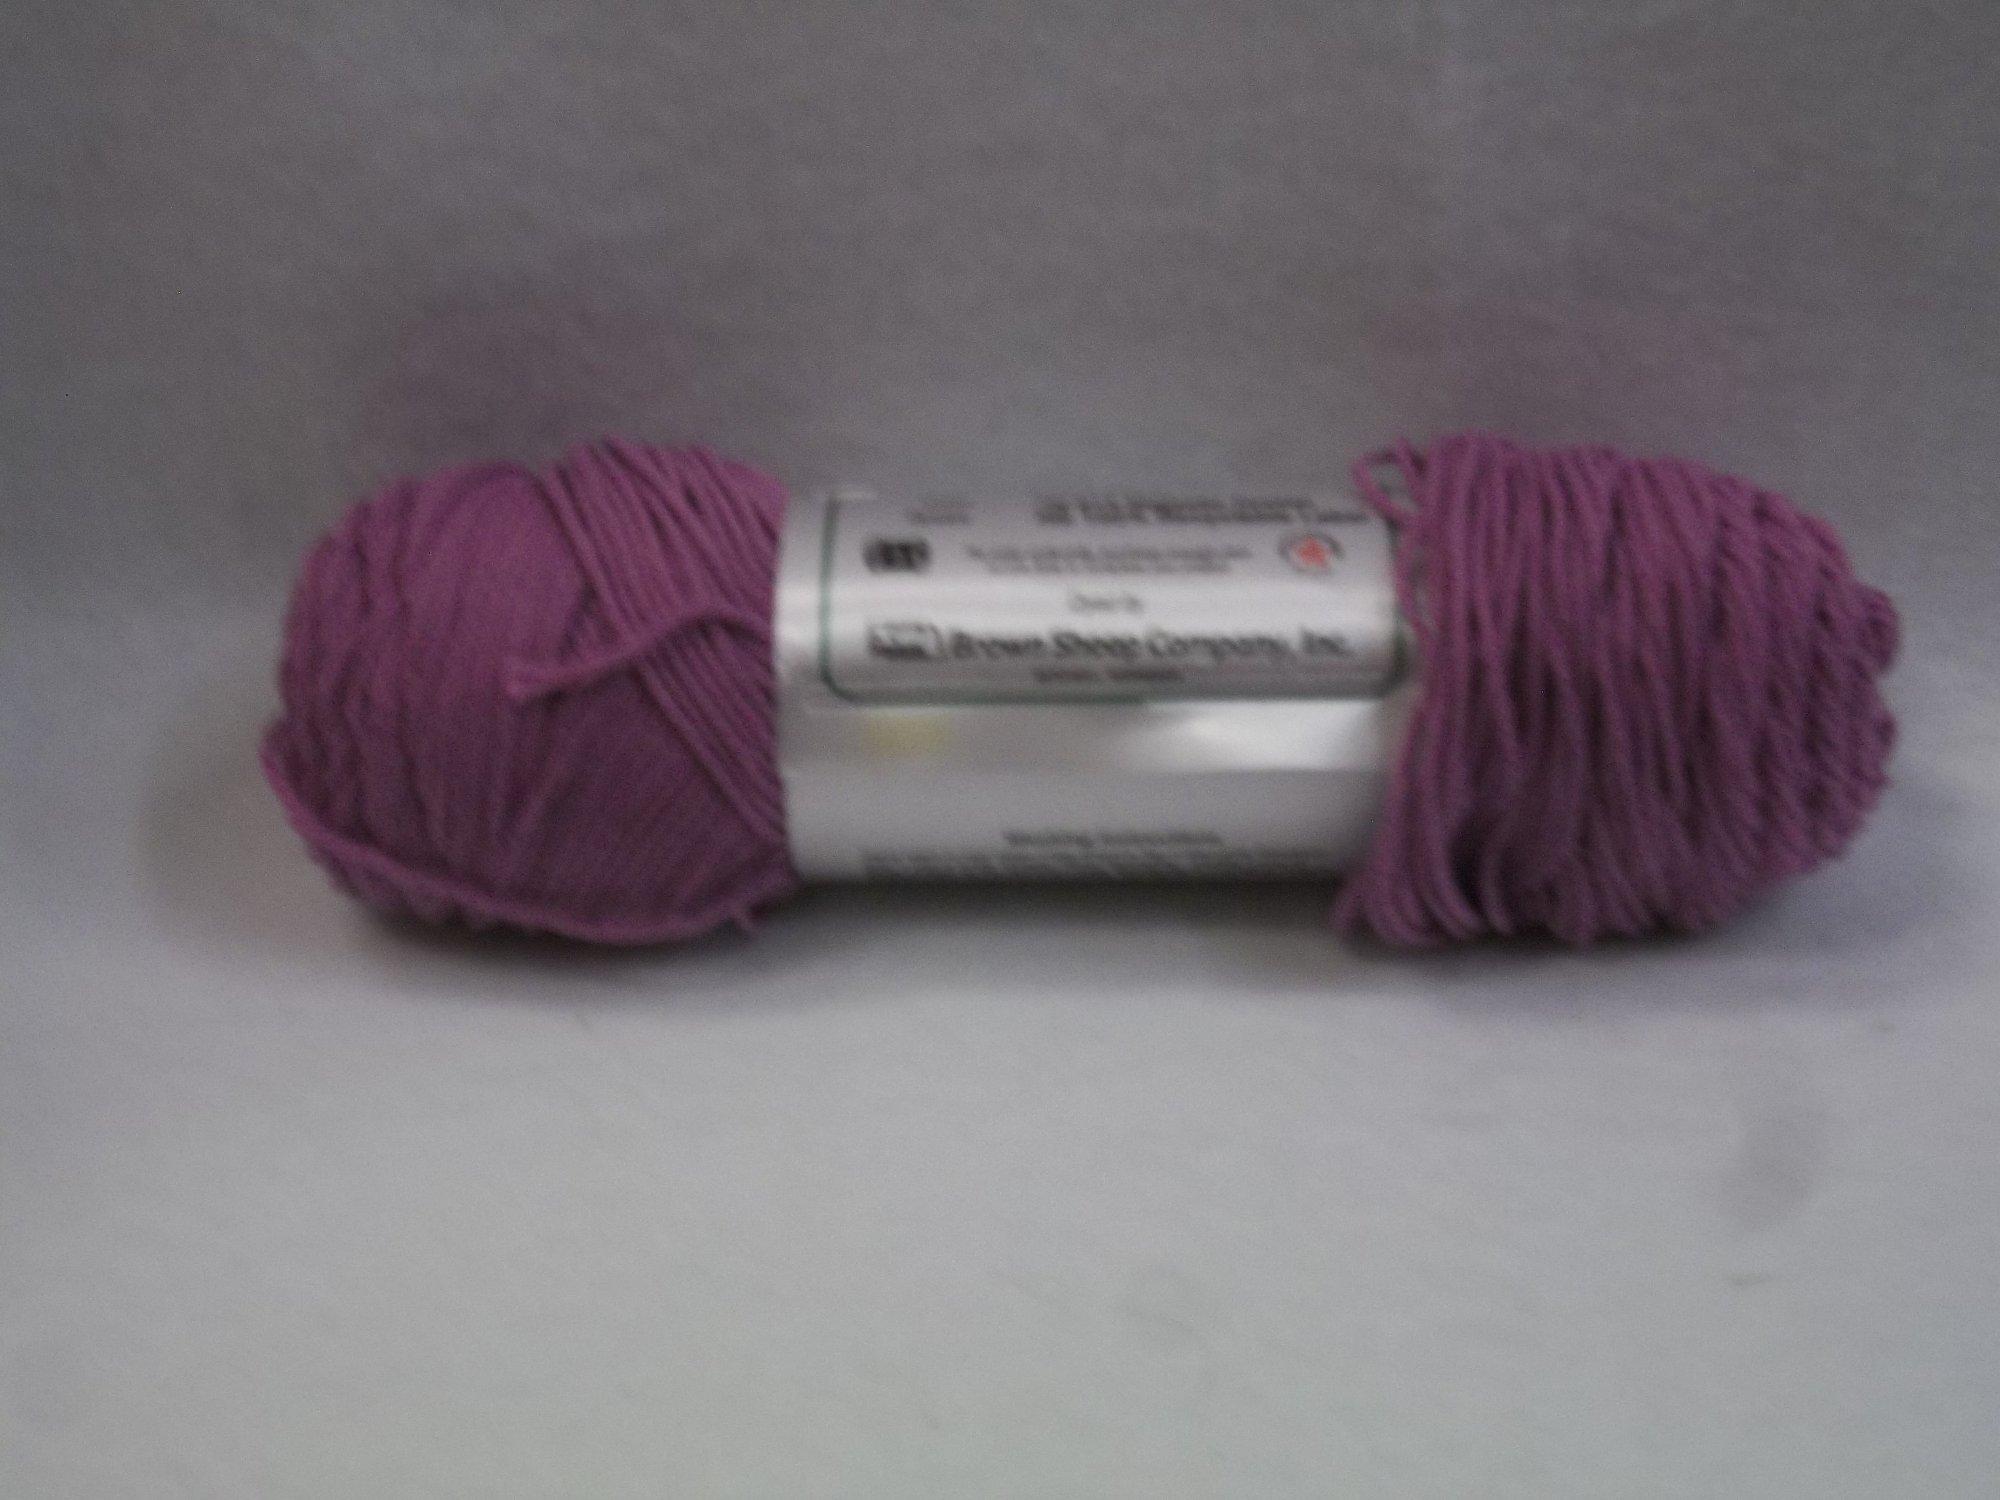 Cotton Fleece - CW-915 Majestic Orchid